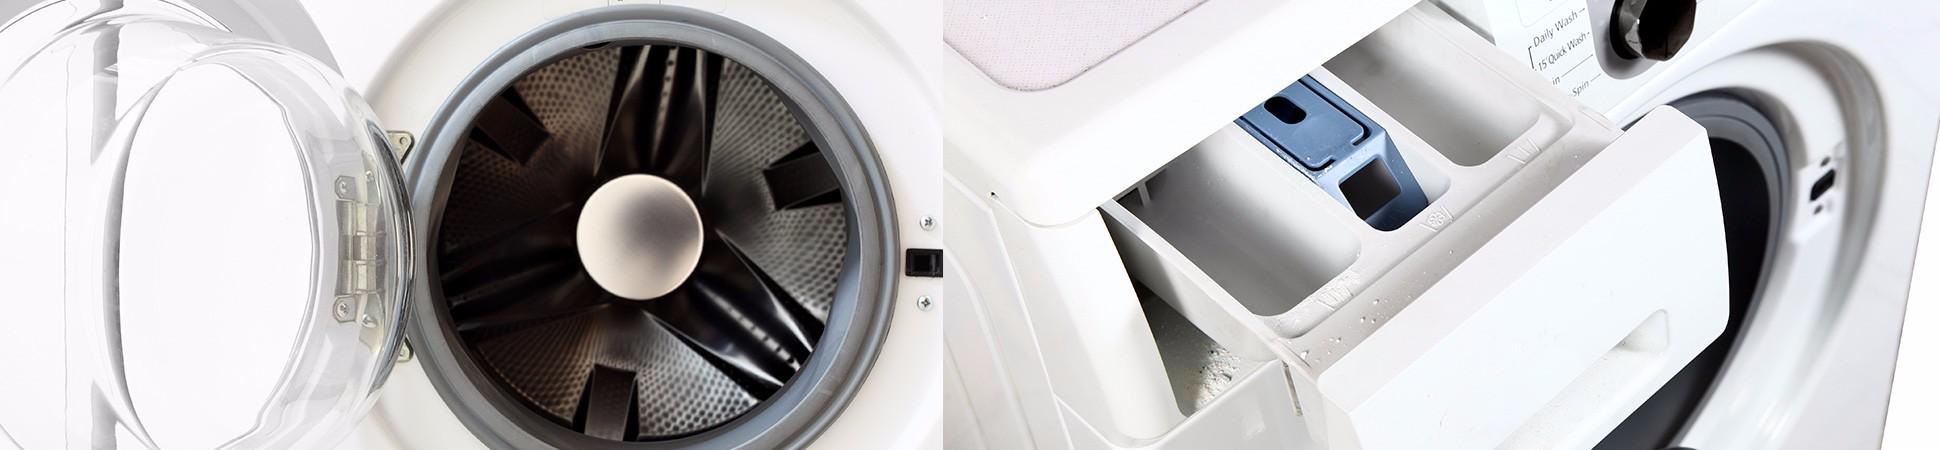 appliance-parts